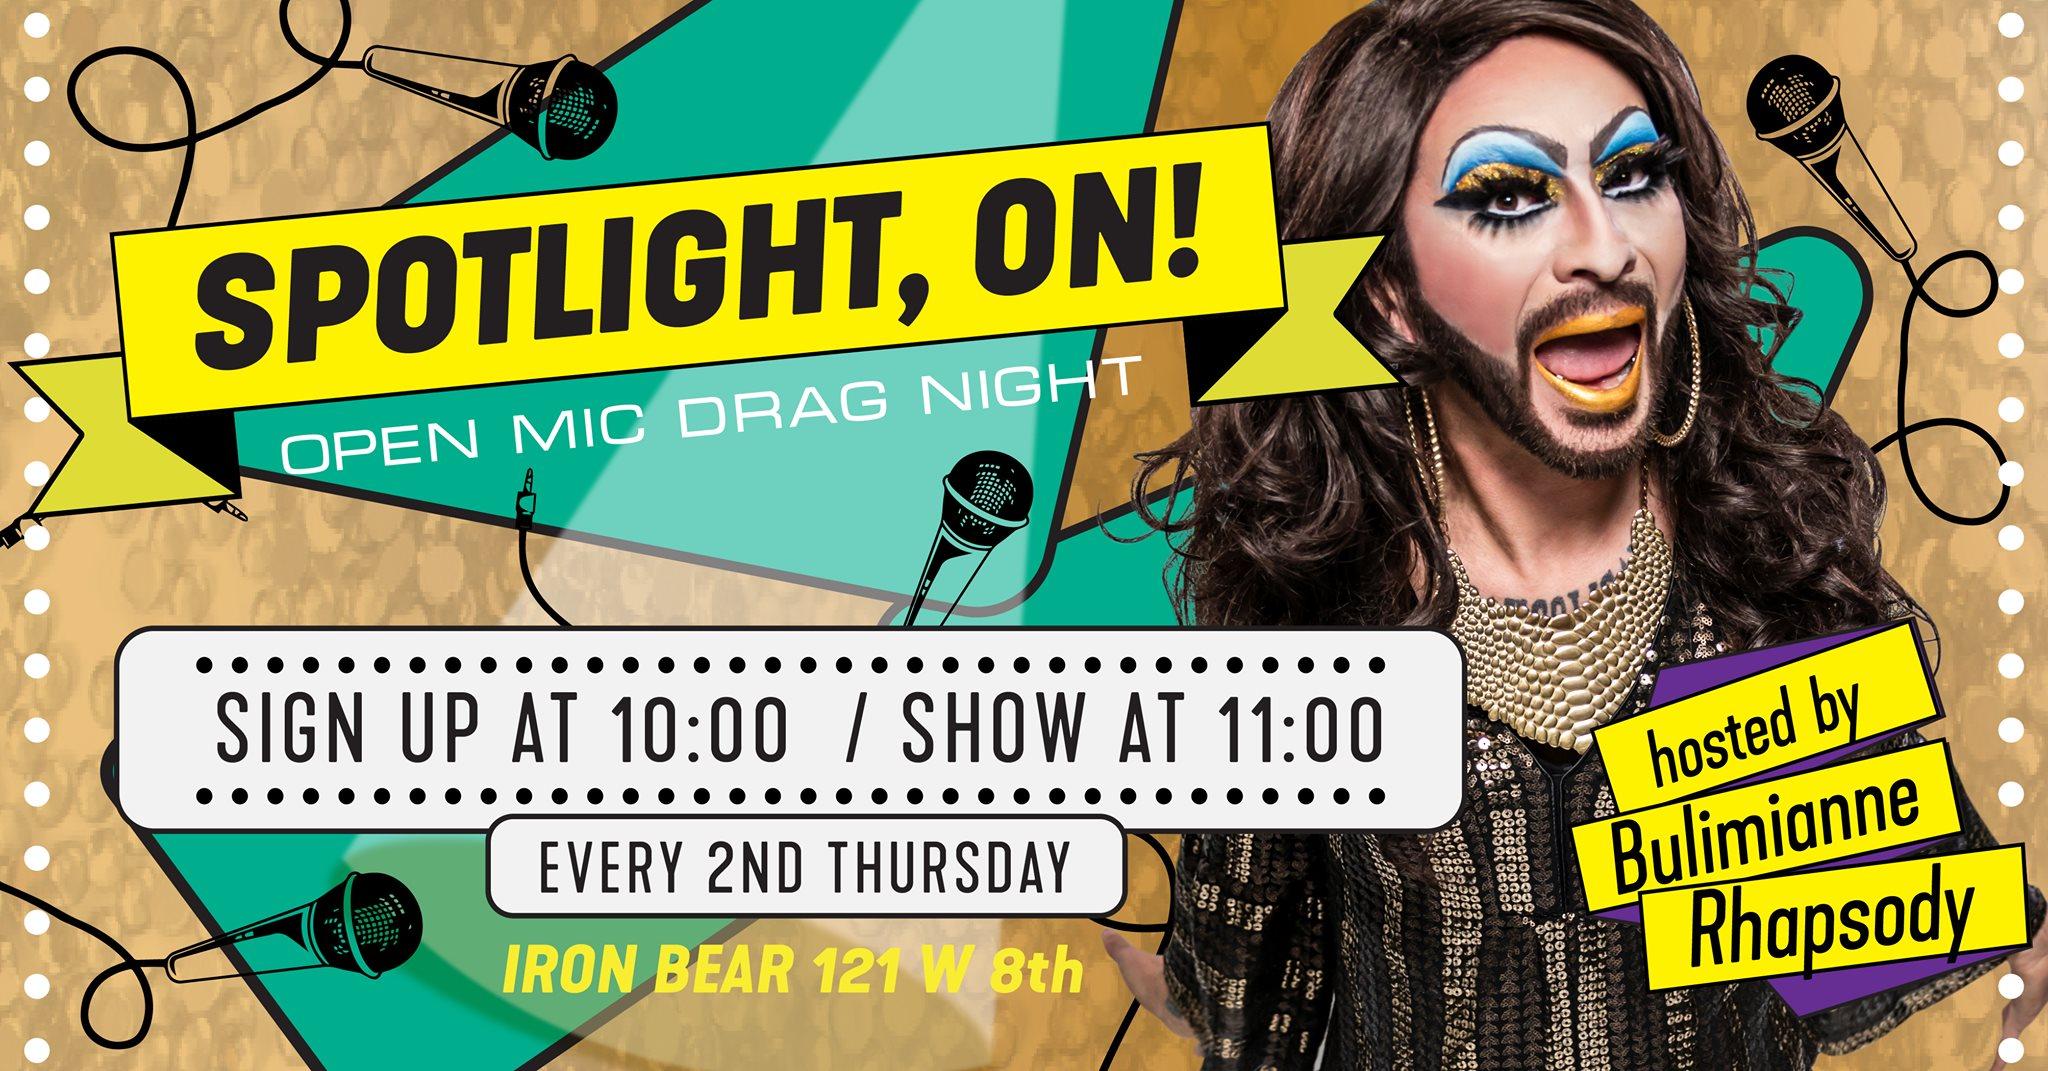 Spotlight, ON! Open Mic Drag Night